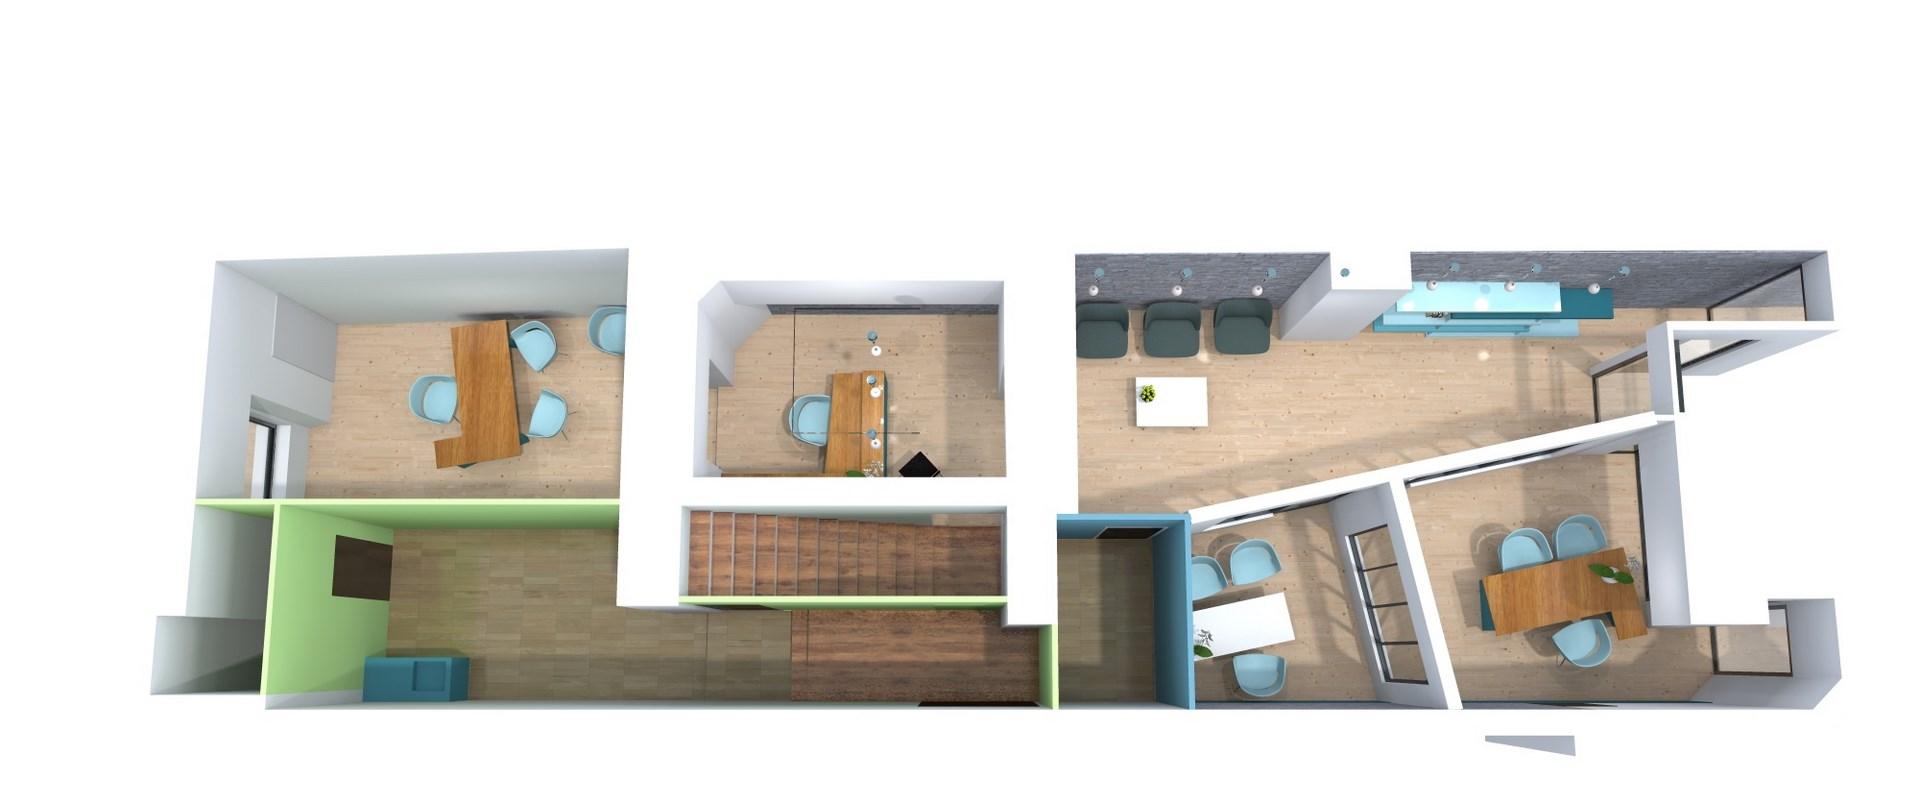 interim bureau d etudes 28 images interim product project management in the electronics. Black Bedroom Furniture Sets. Home Design Ideas